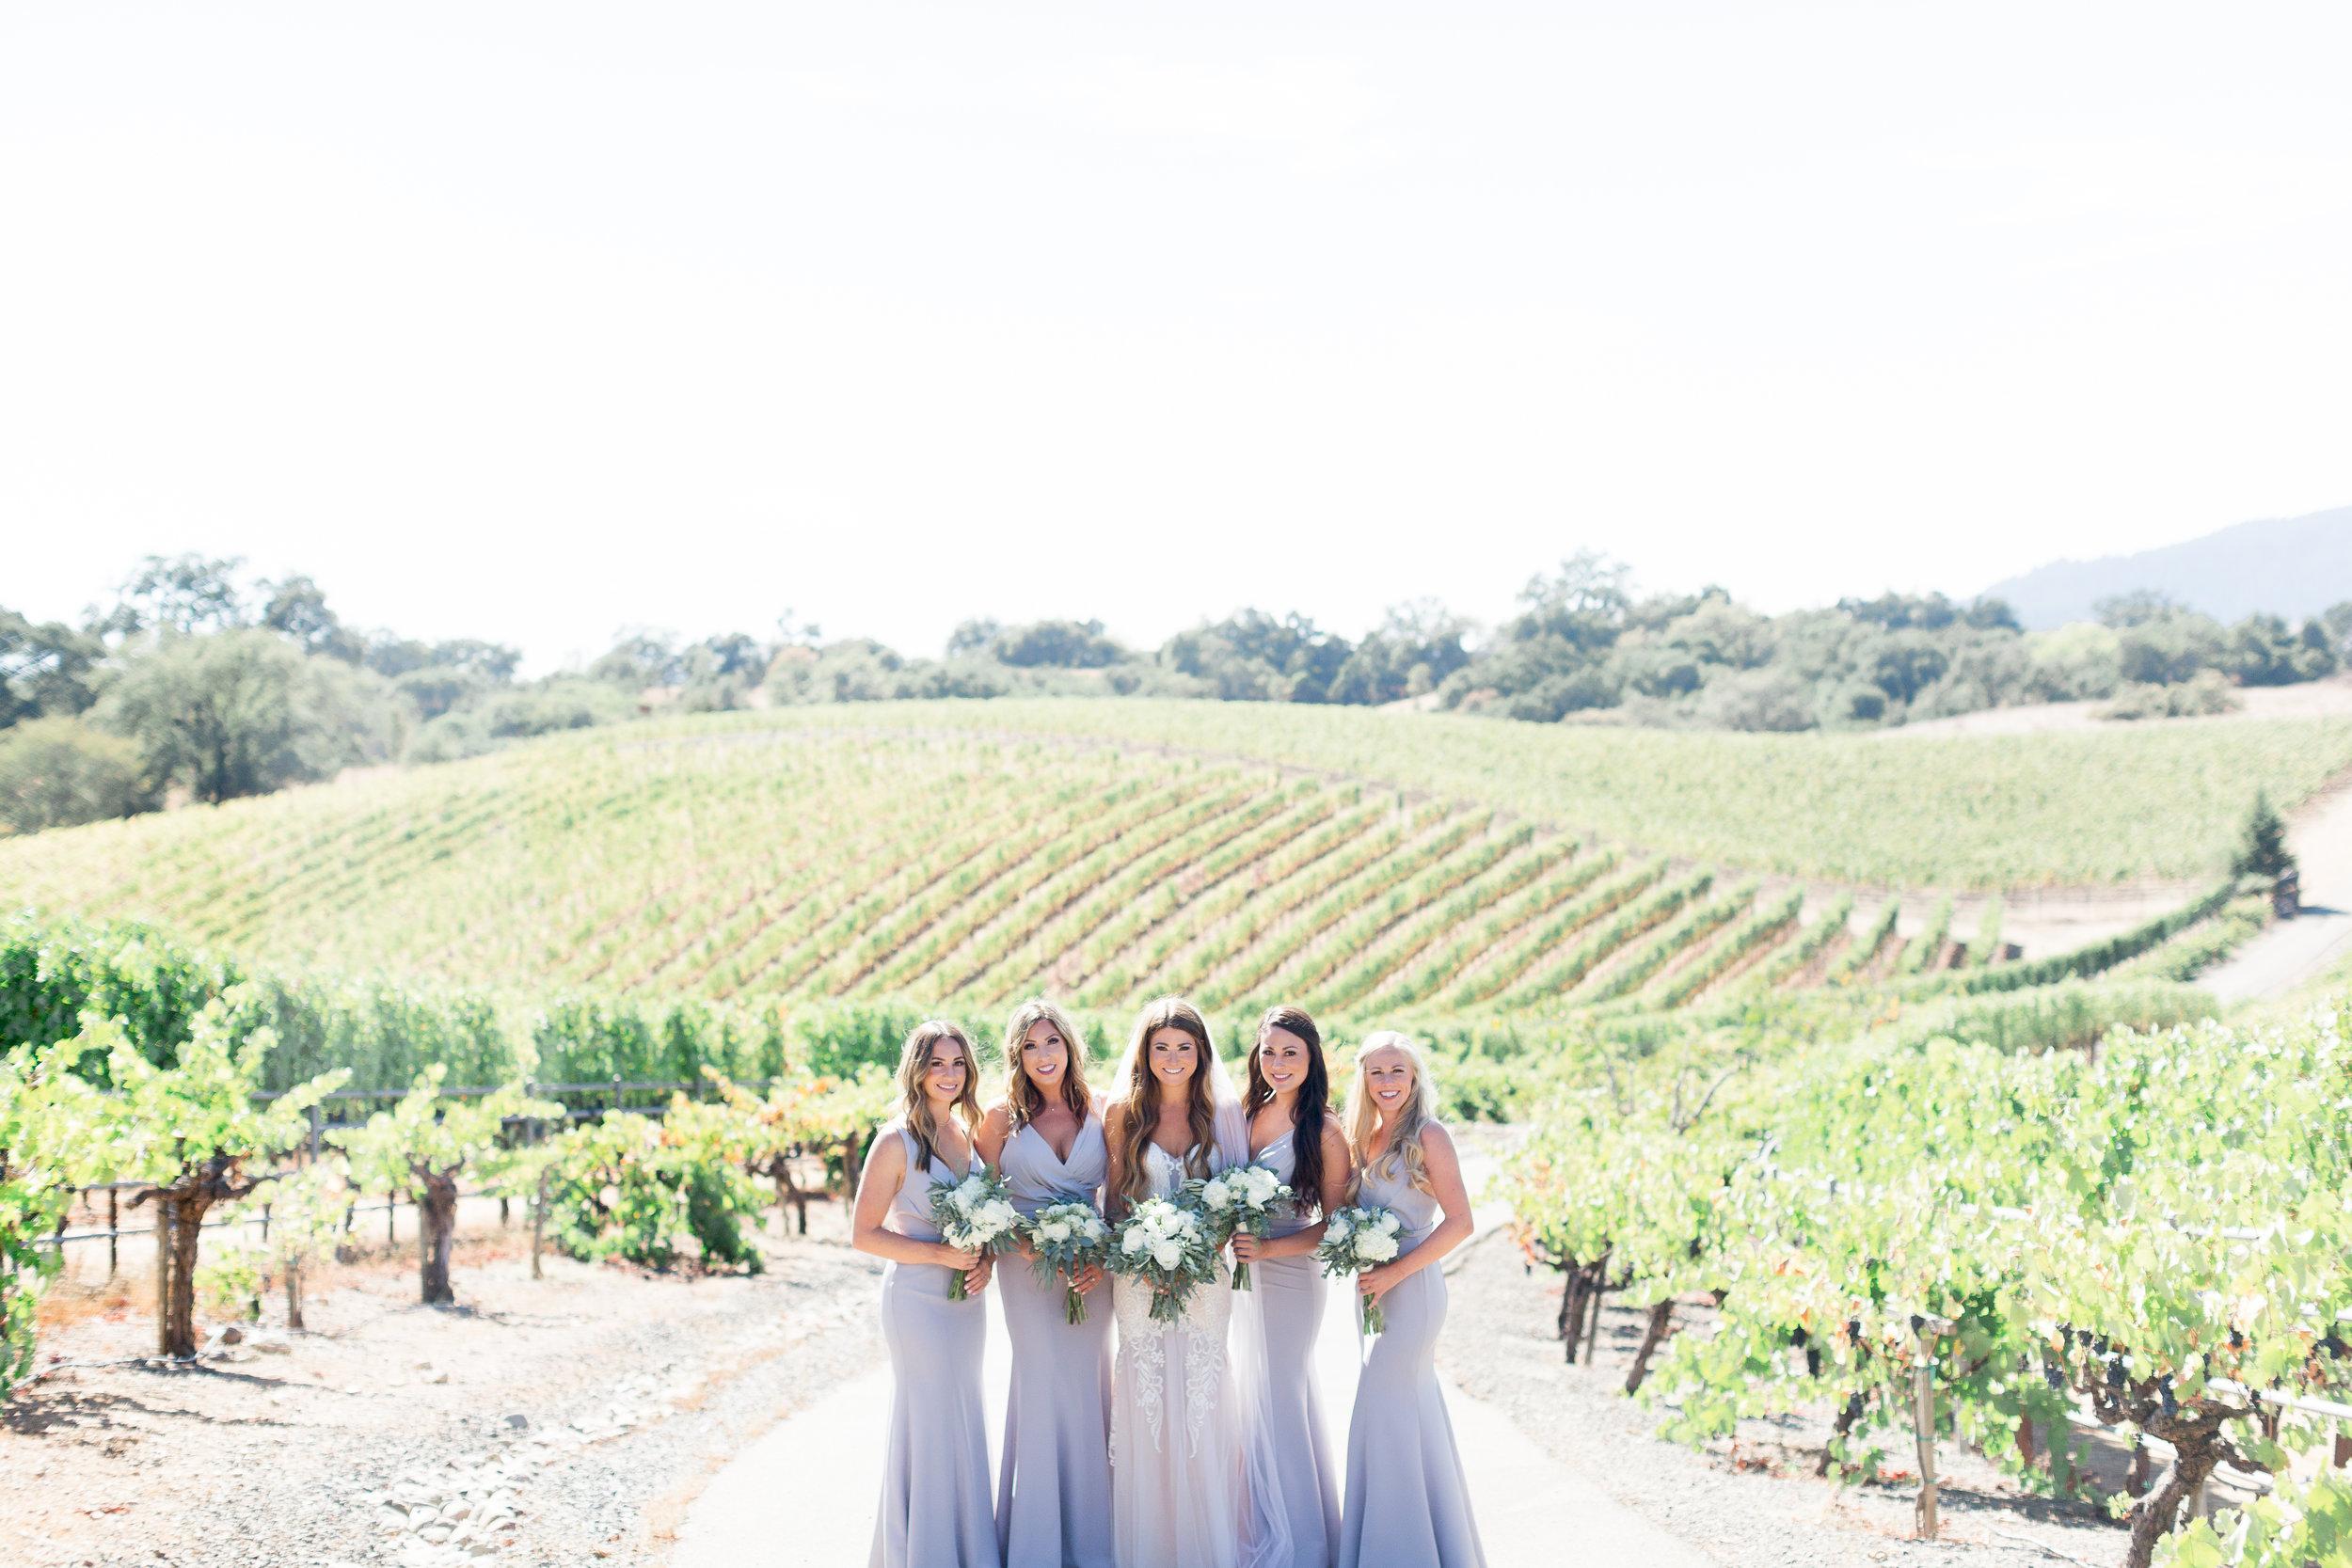 Calegari-Vineyards-Healdsburg-Wedding-Photographer (113 of 262).jpg